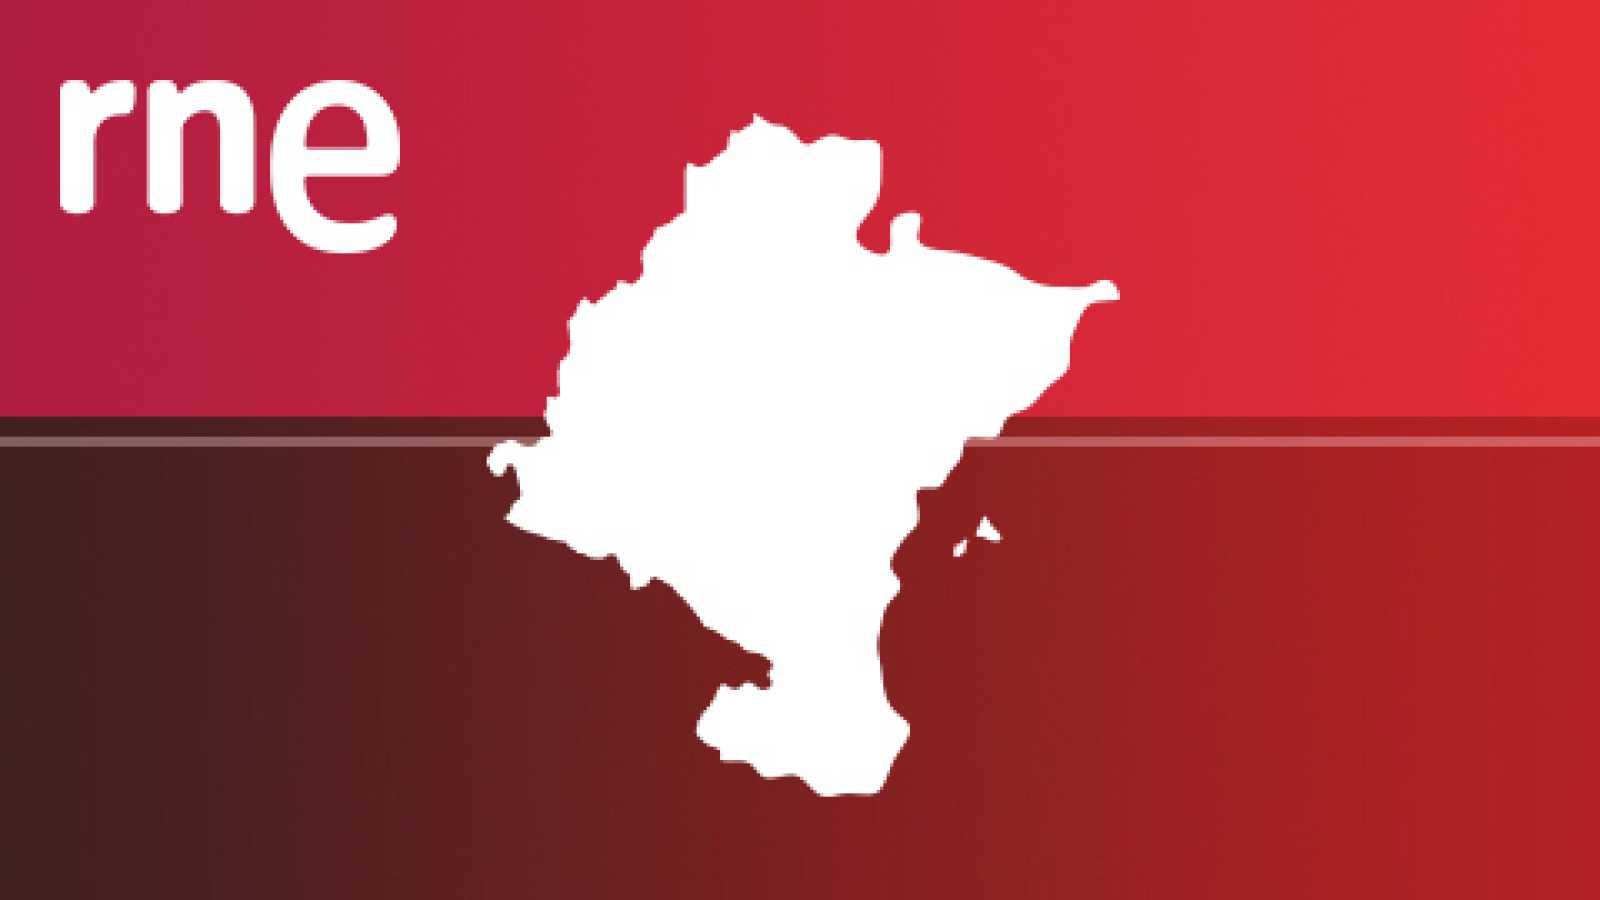 Crónica Navarra - Aoiz se queda sin Gamesa - 01/07/20 - Escuchar ahora